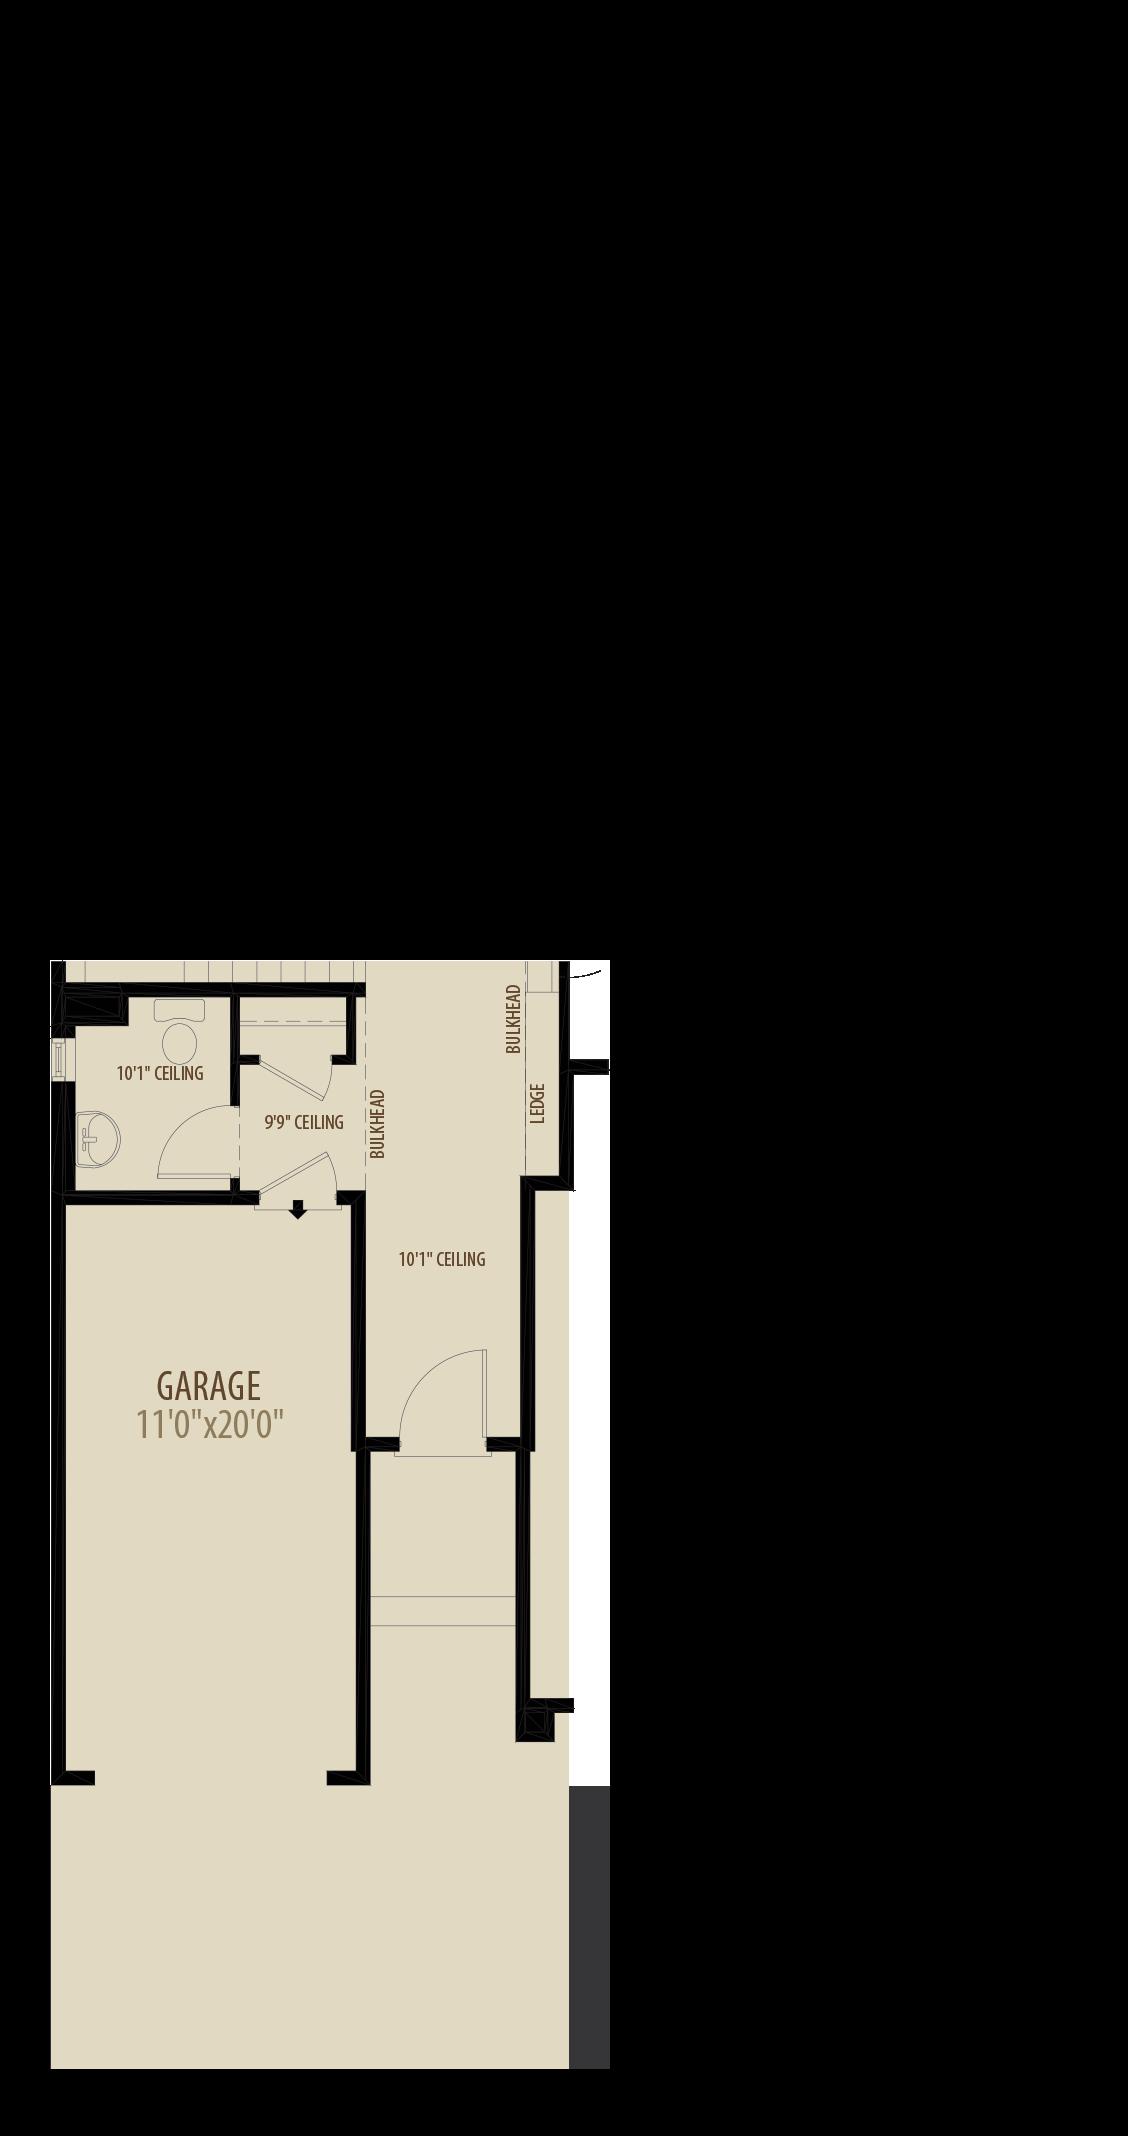 Den Removal Removes 111 sq ft